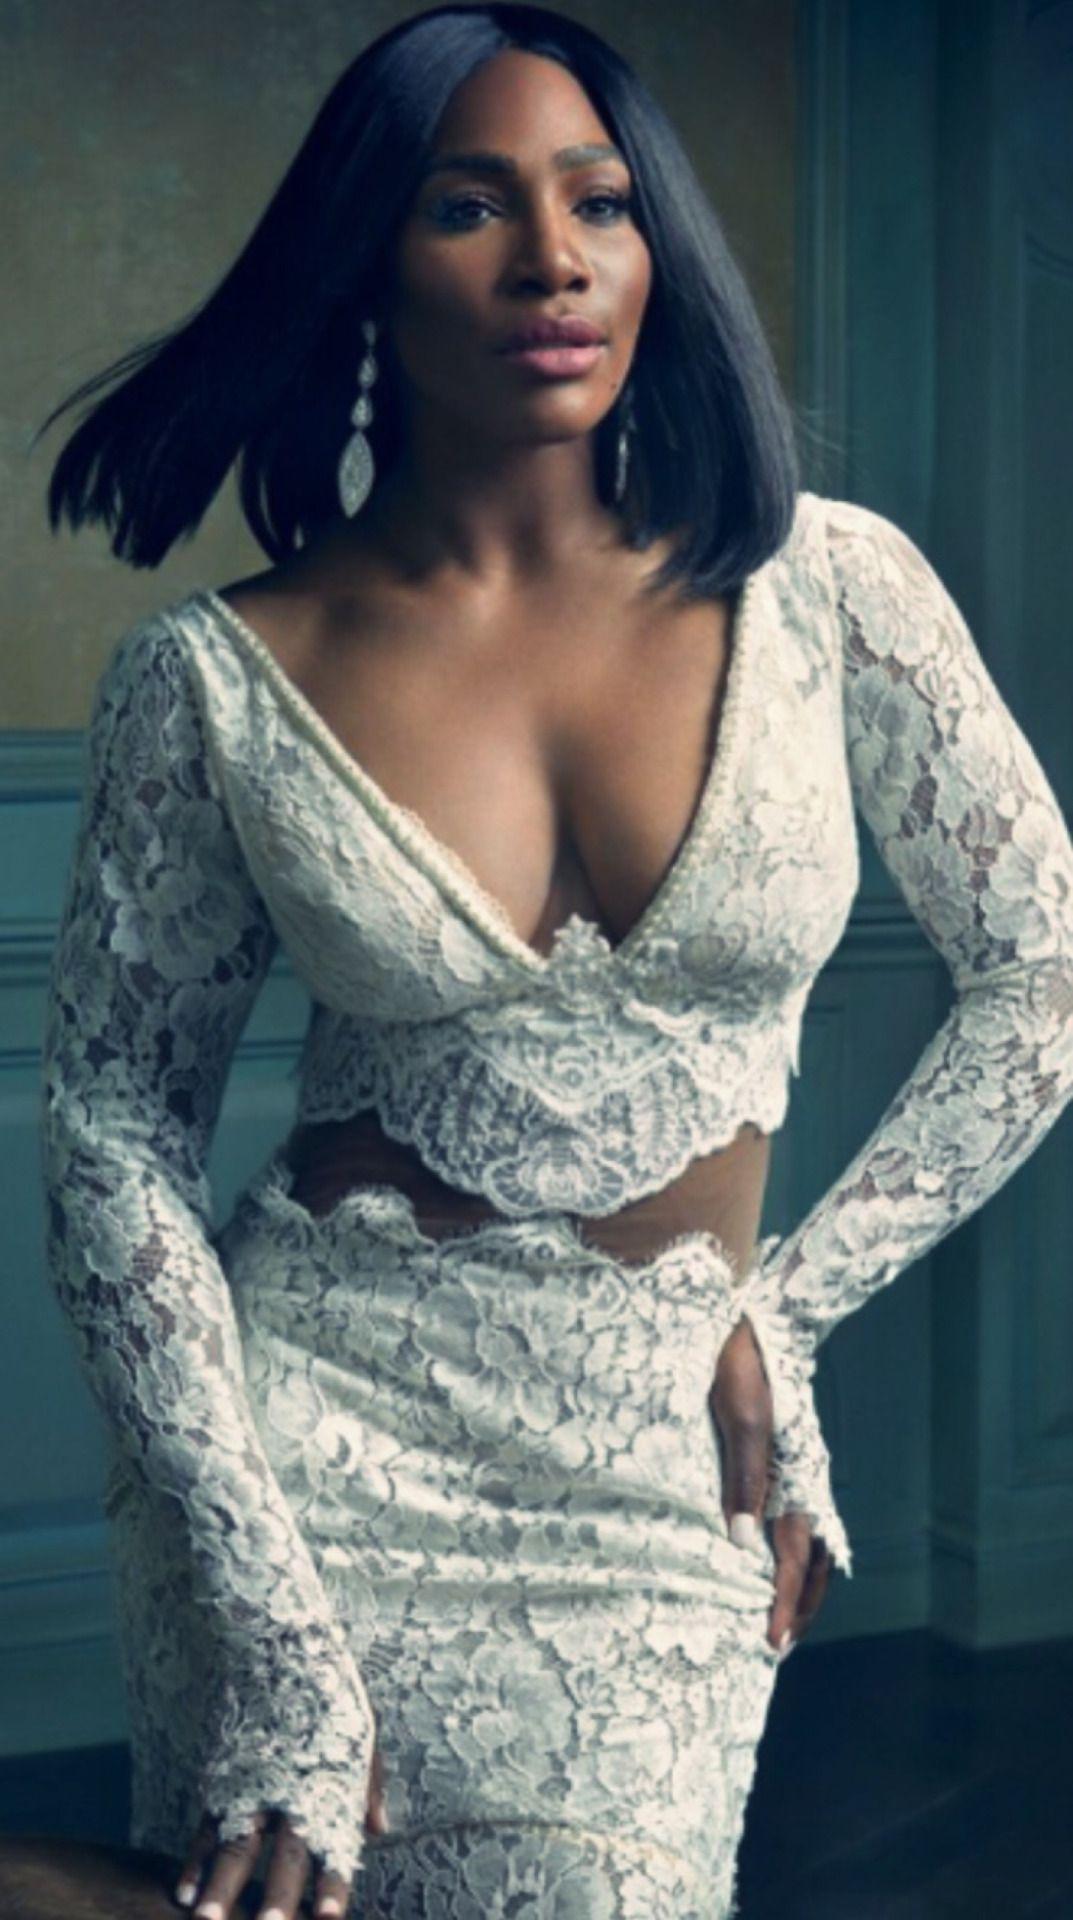 Serena williams tumblr sexy sportlerinnen pinterest black serena williams tumblr nvjuhfo Image collections